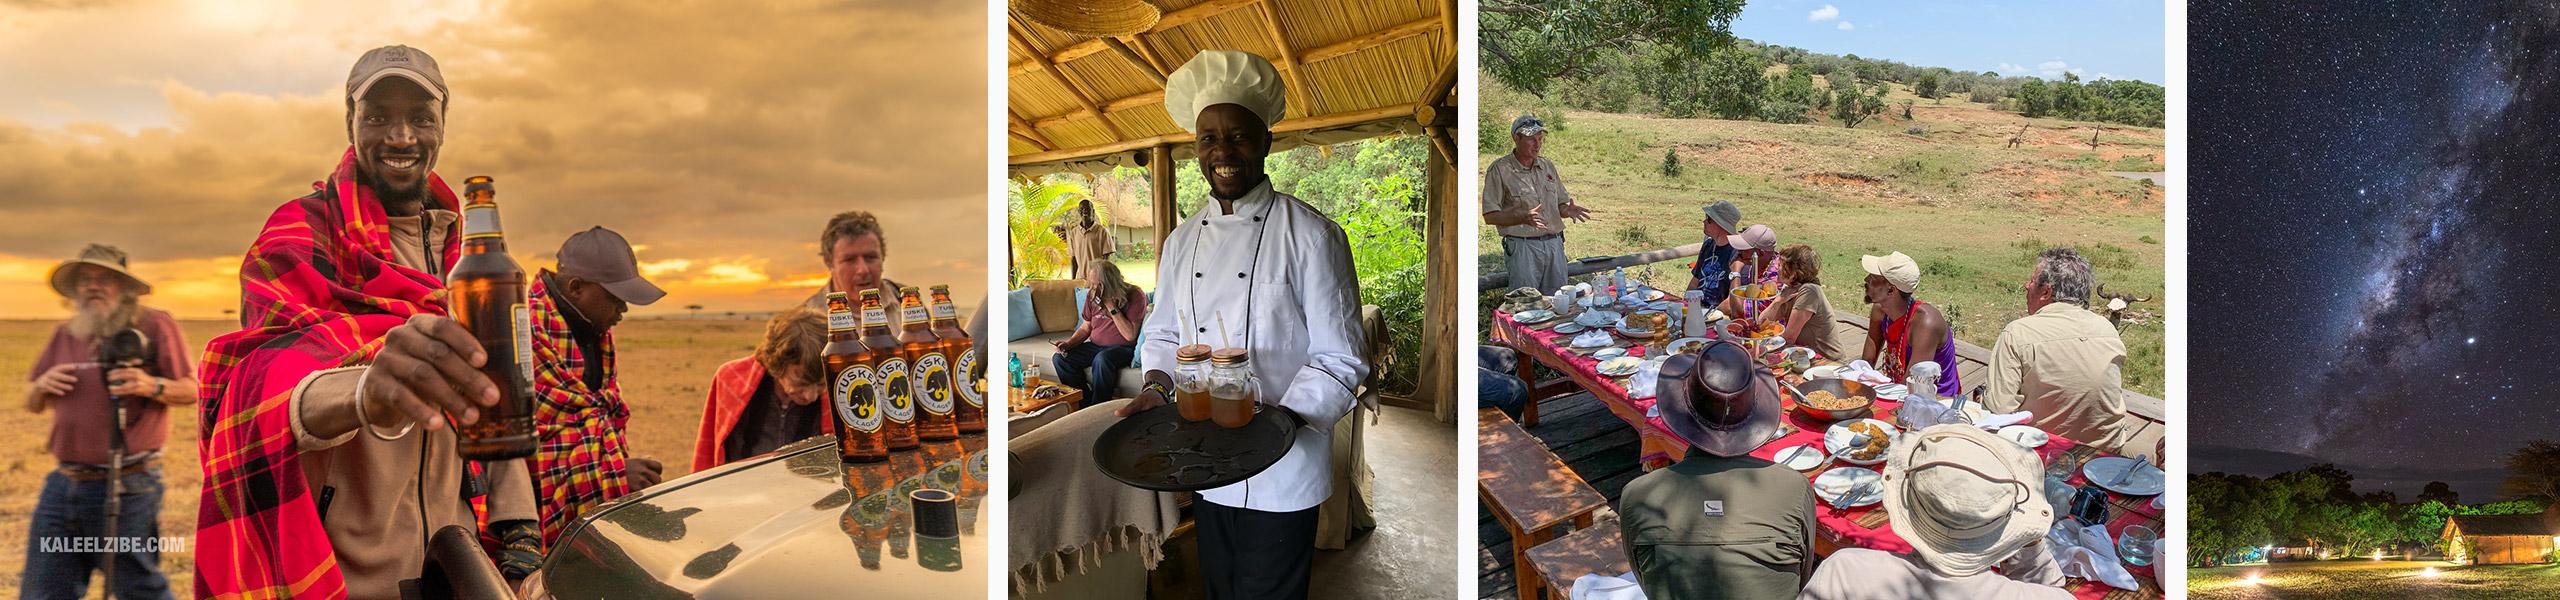 African Wildlife Photography Safaris Sundowners, refreshments, breakfast and the Milky Way in the Maasai Mara